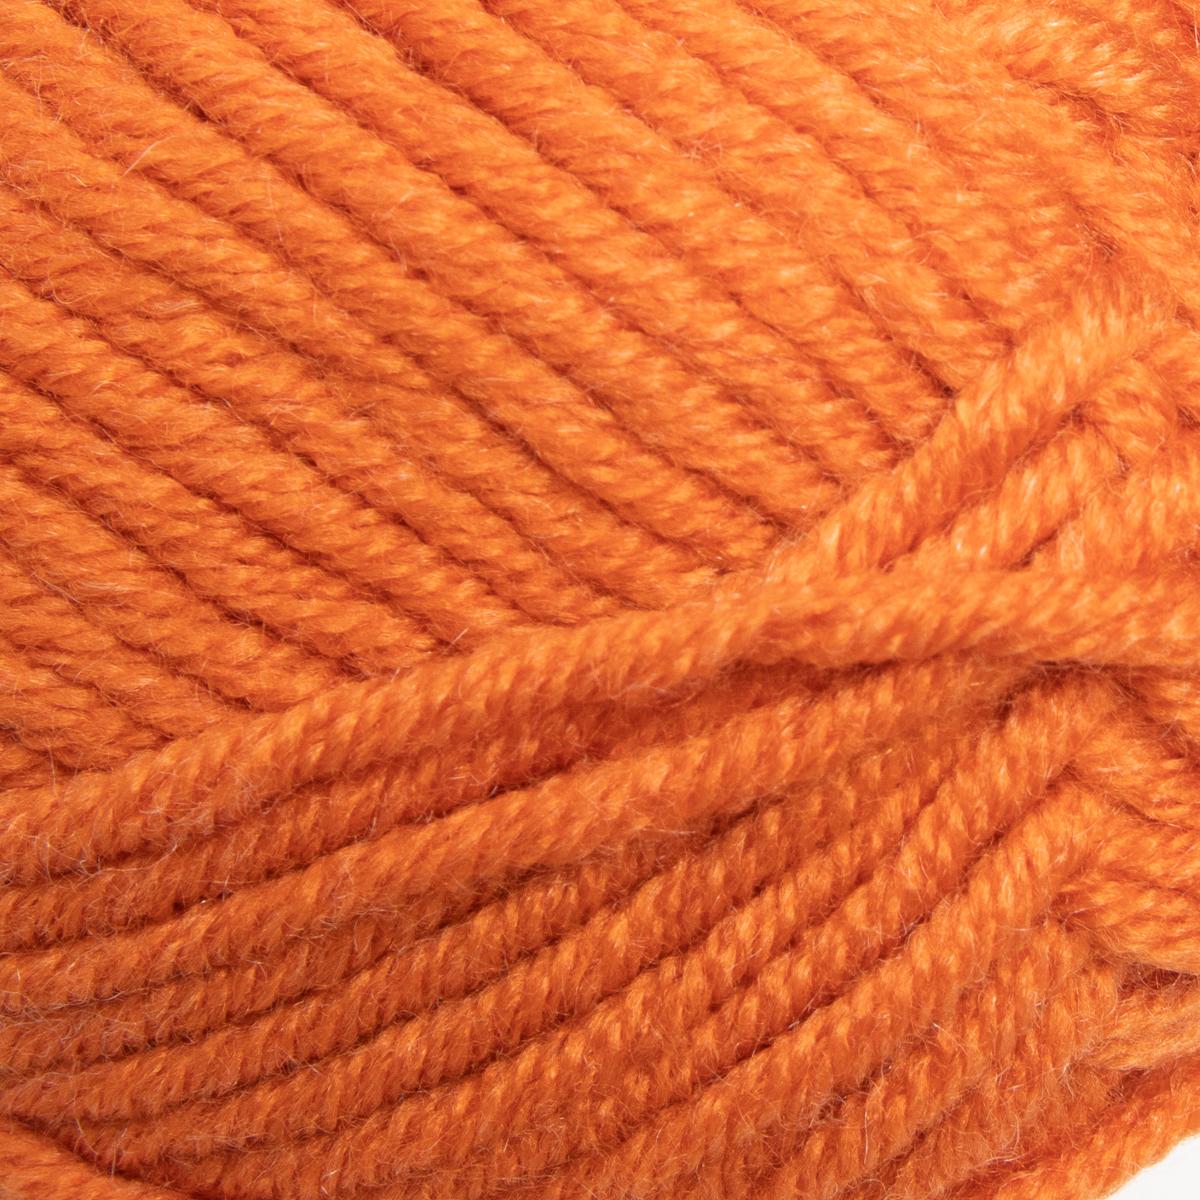 3pk-Lion-Brand-Woolspun-Acrylic-amp-Wool-Yarn-Bulky-5-Knit-Crocheting-Skeins-Soft thumbnail 75